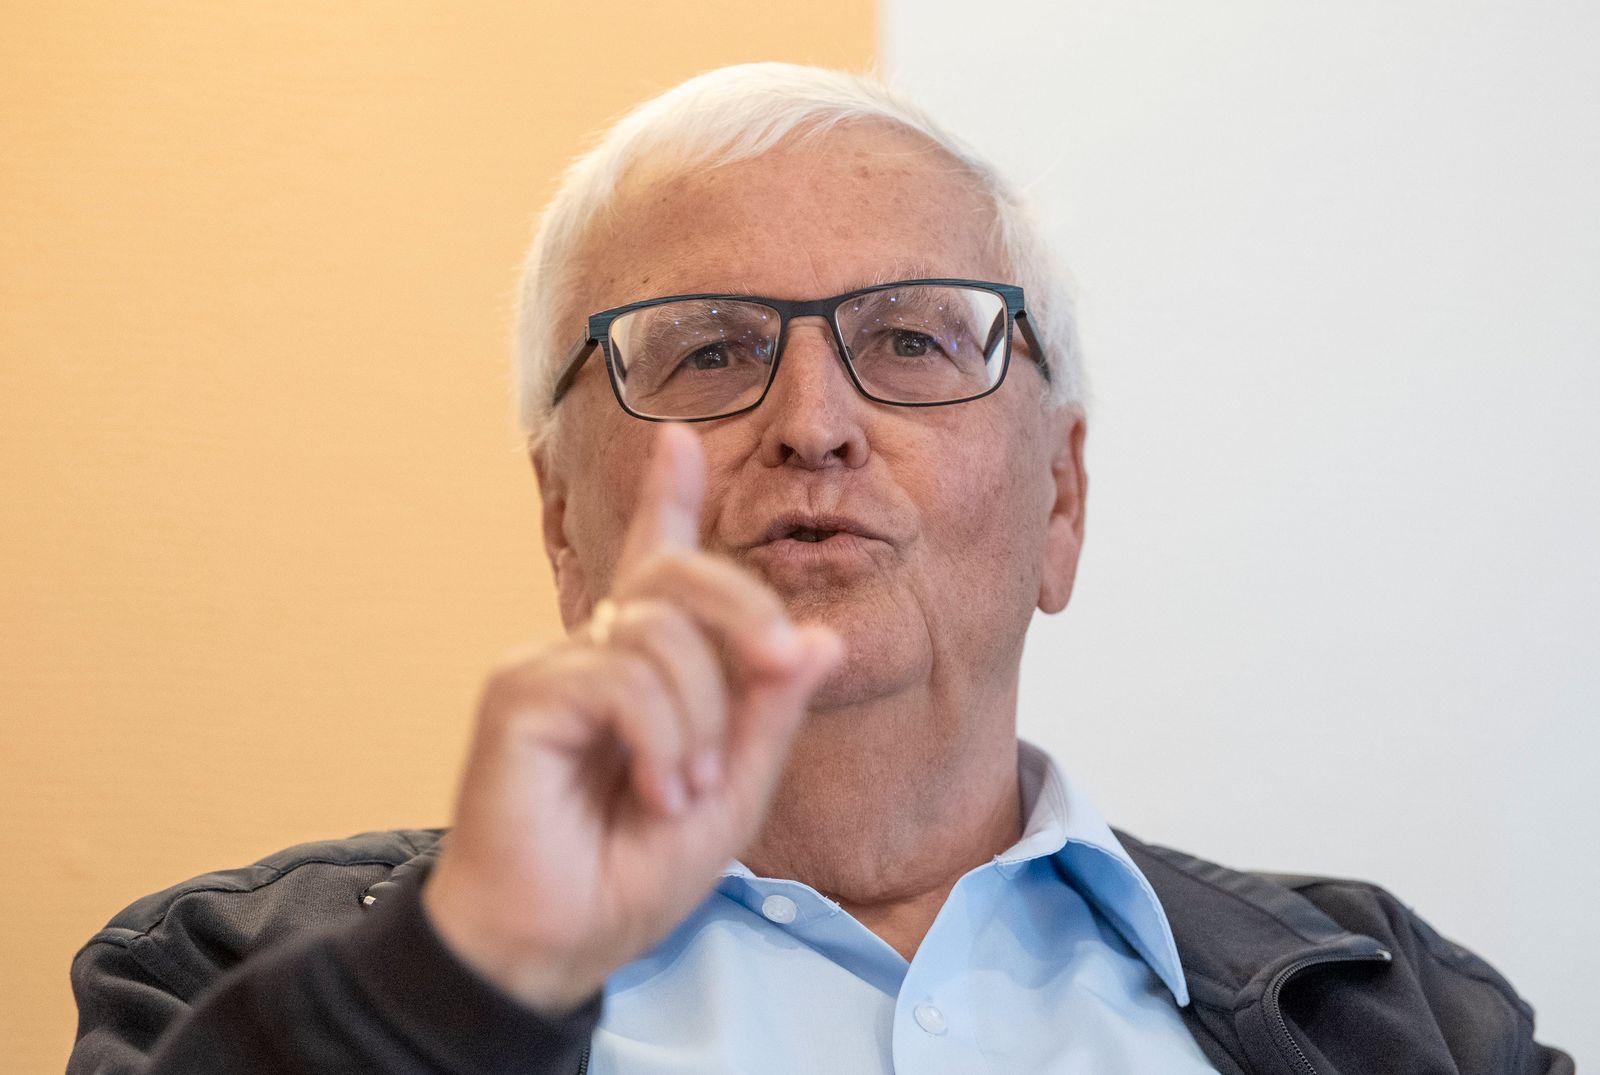 Ehemaliger DFB-Präsident Zwanziger